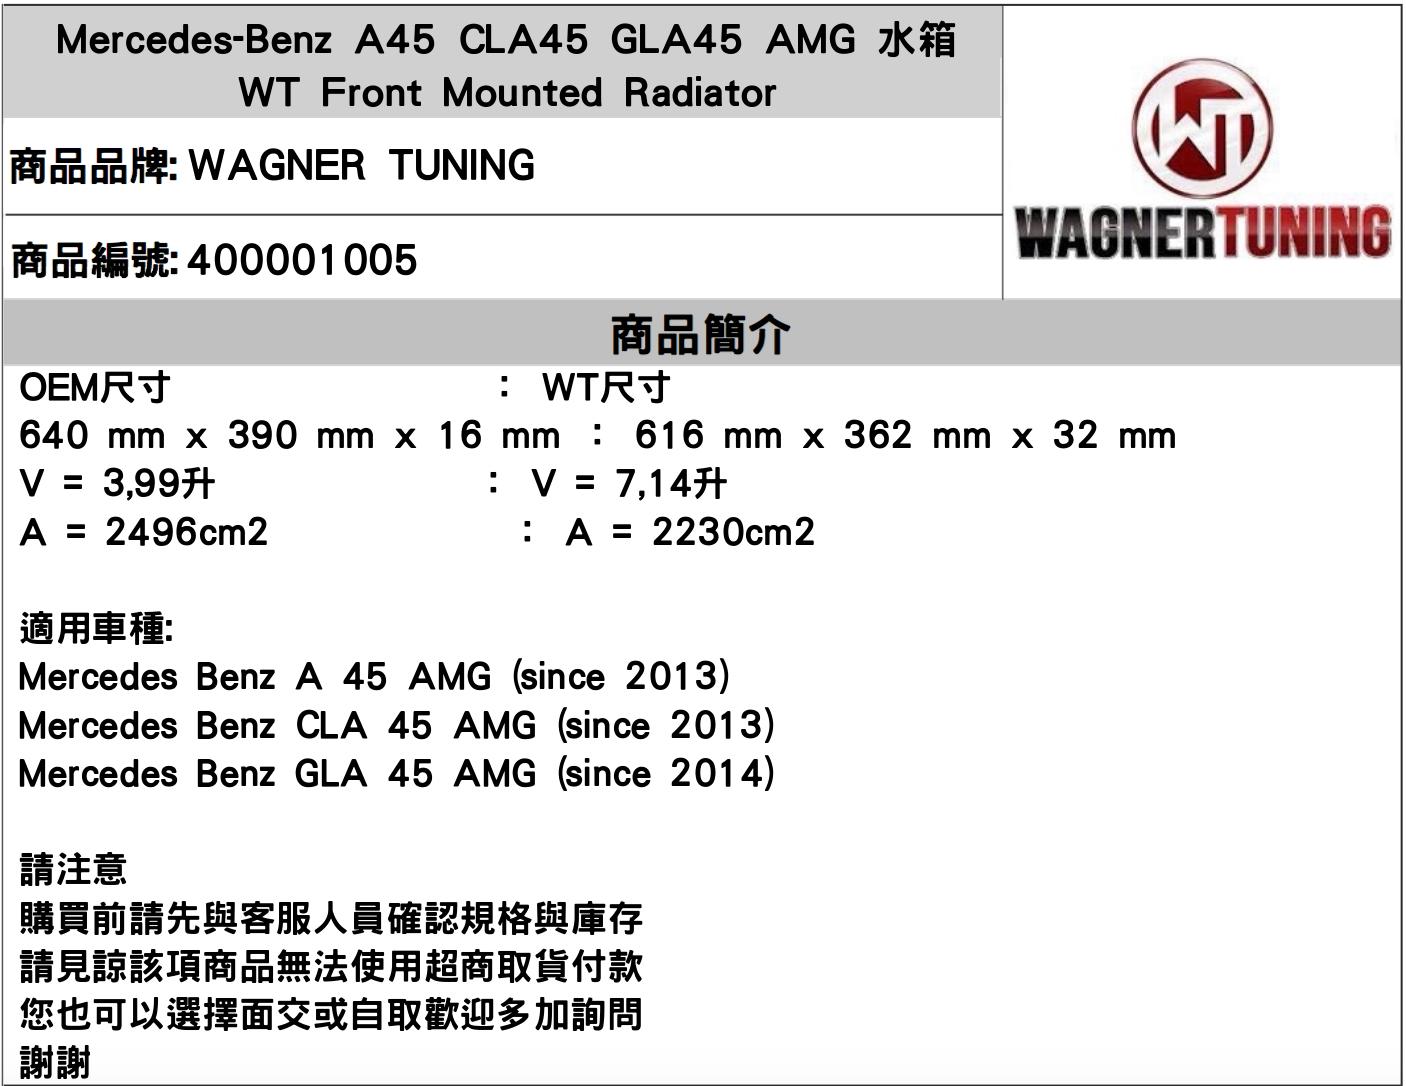 MercedesBenz A45 CLA45 GLA45 AMG 水箱 WT Front MountedRadiator